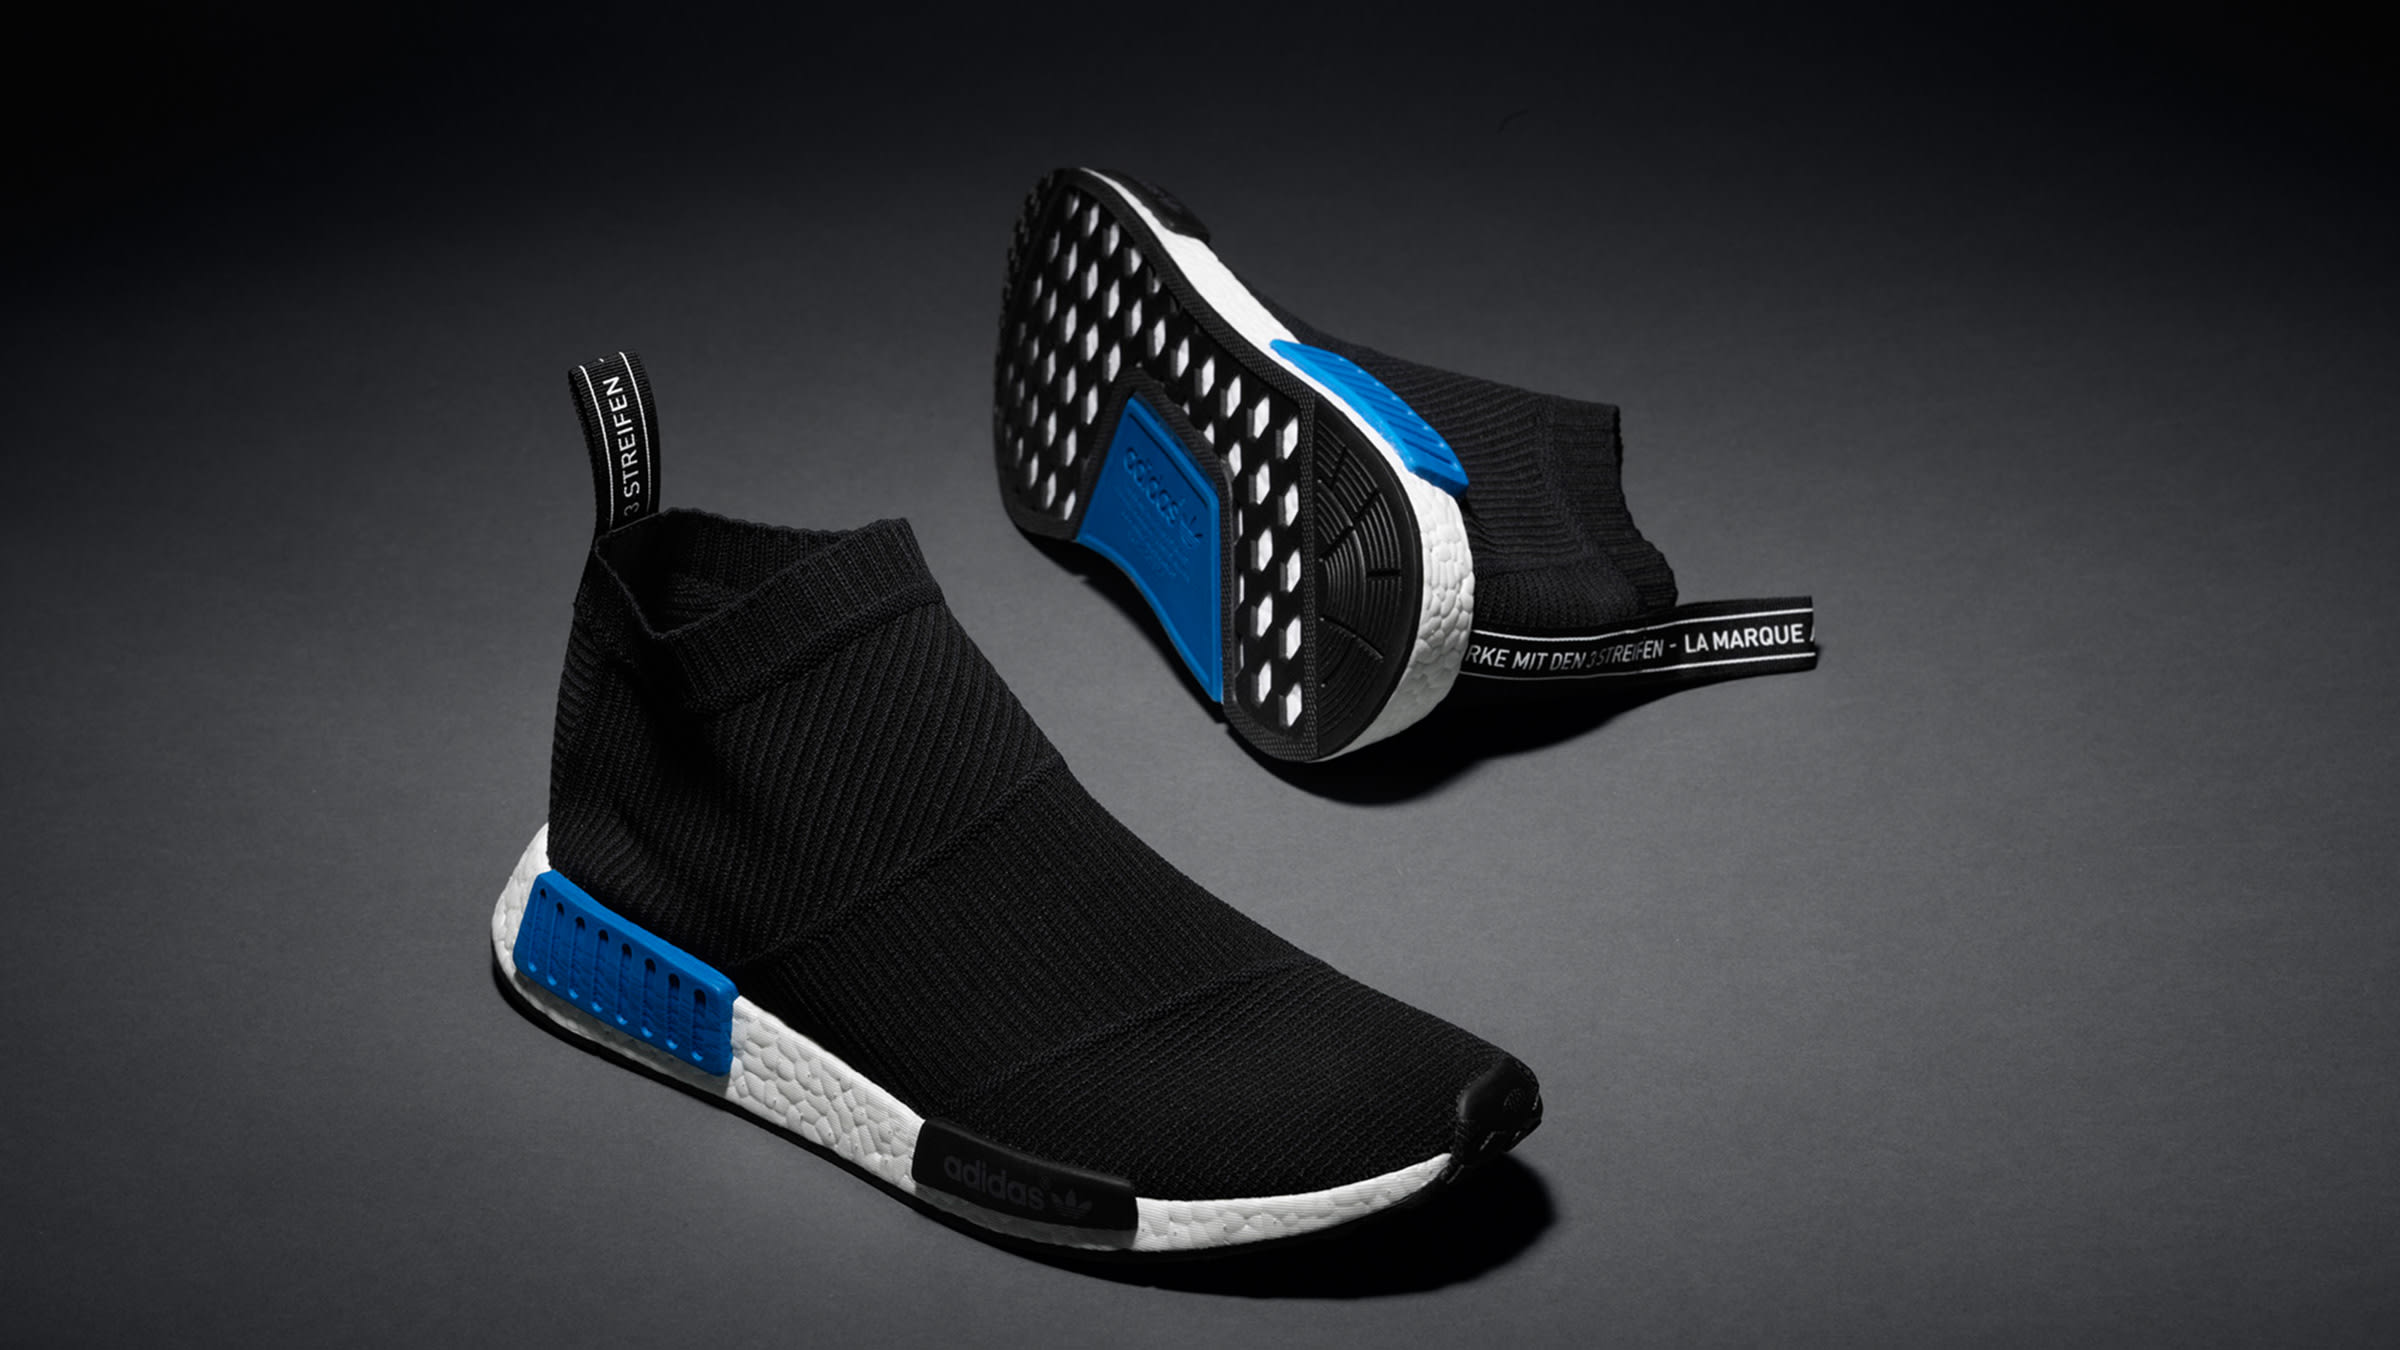 73bca60efa395 Adidas NMD CS1 PrimeKnit Core Black   Lush Blue